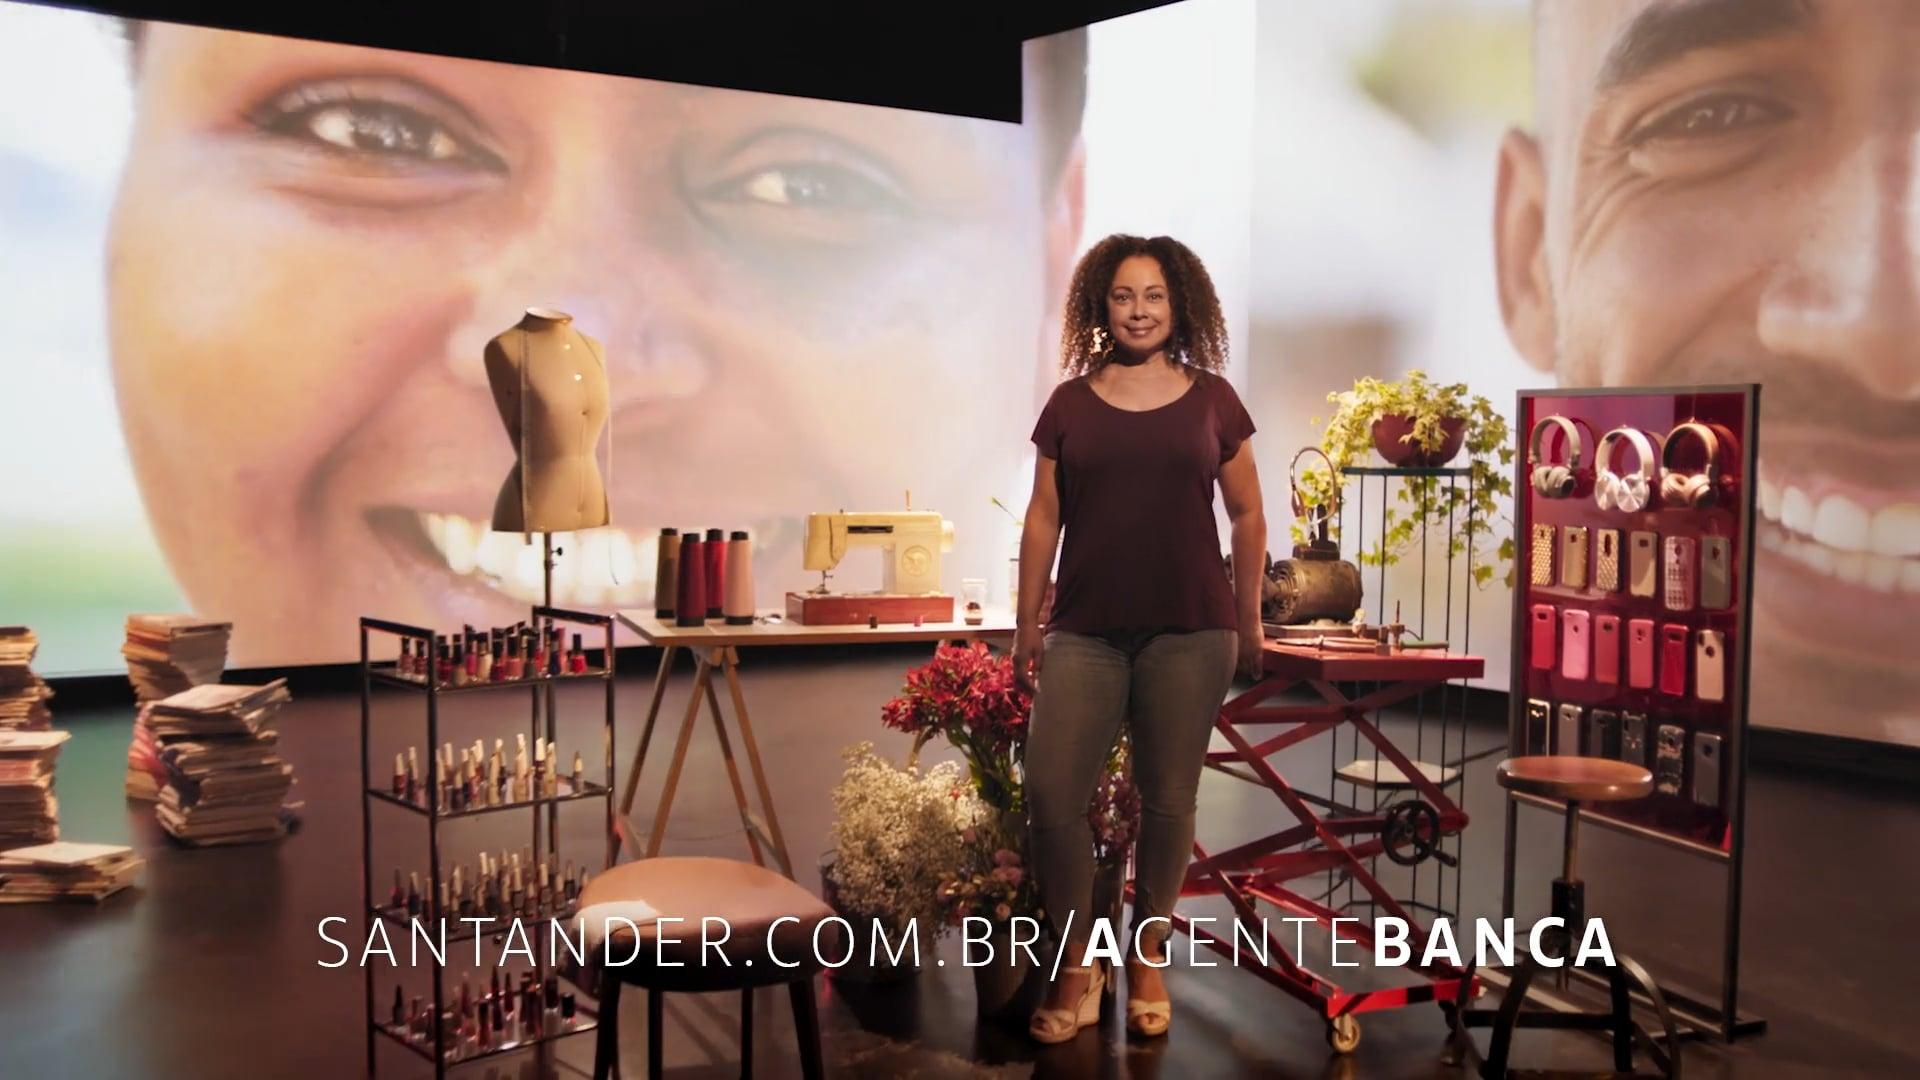 SANTANDER - A Gente Banca Costureira